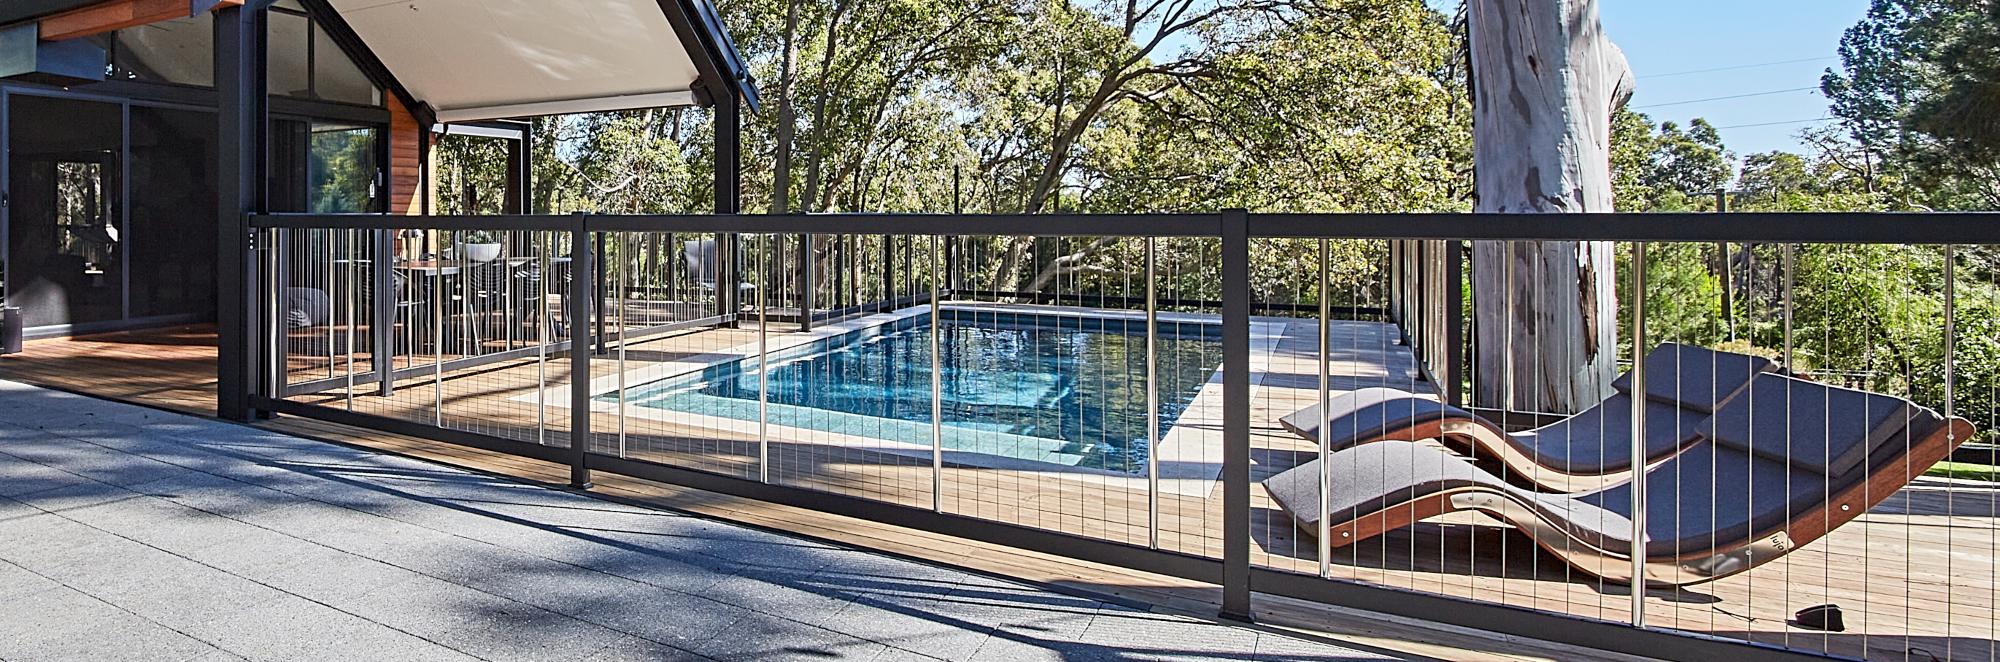 Sentrel Balustrades and Pool Fencing, Pool Fence No Handrail